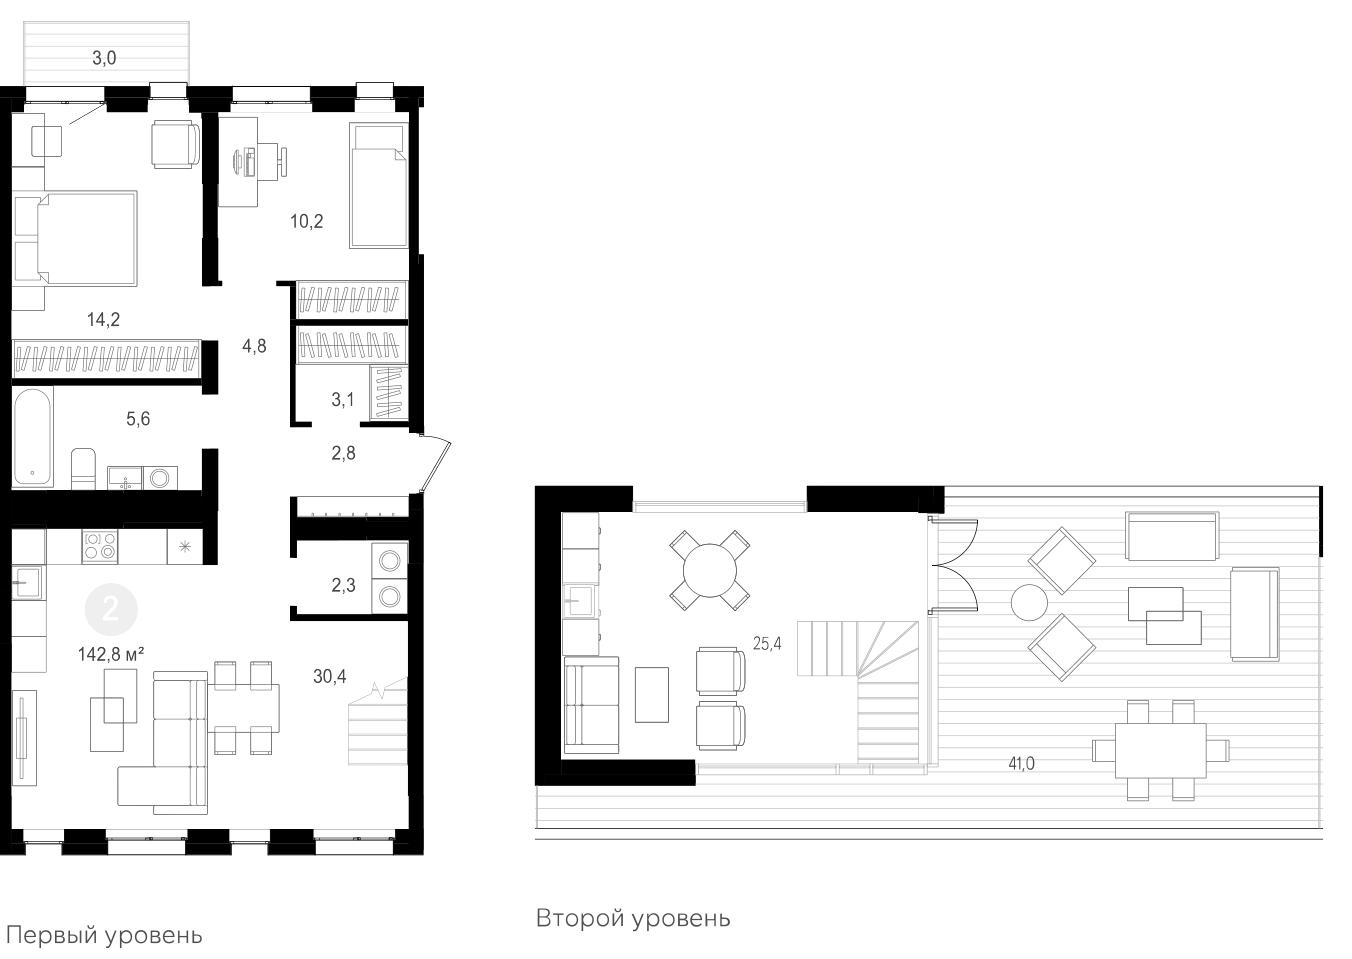 3Е-к.кв, 142.8 м²